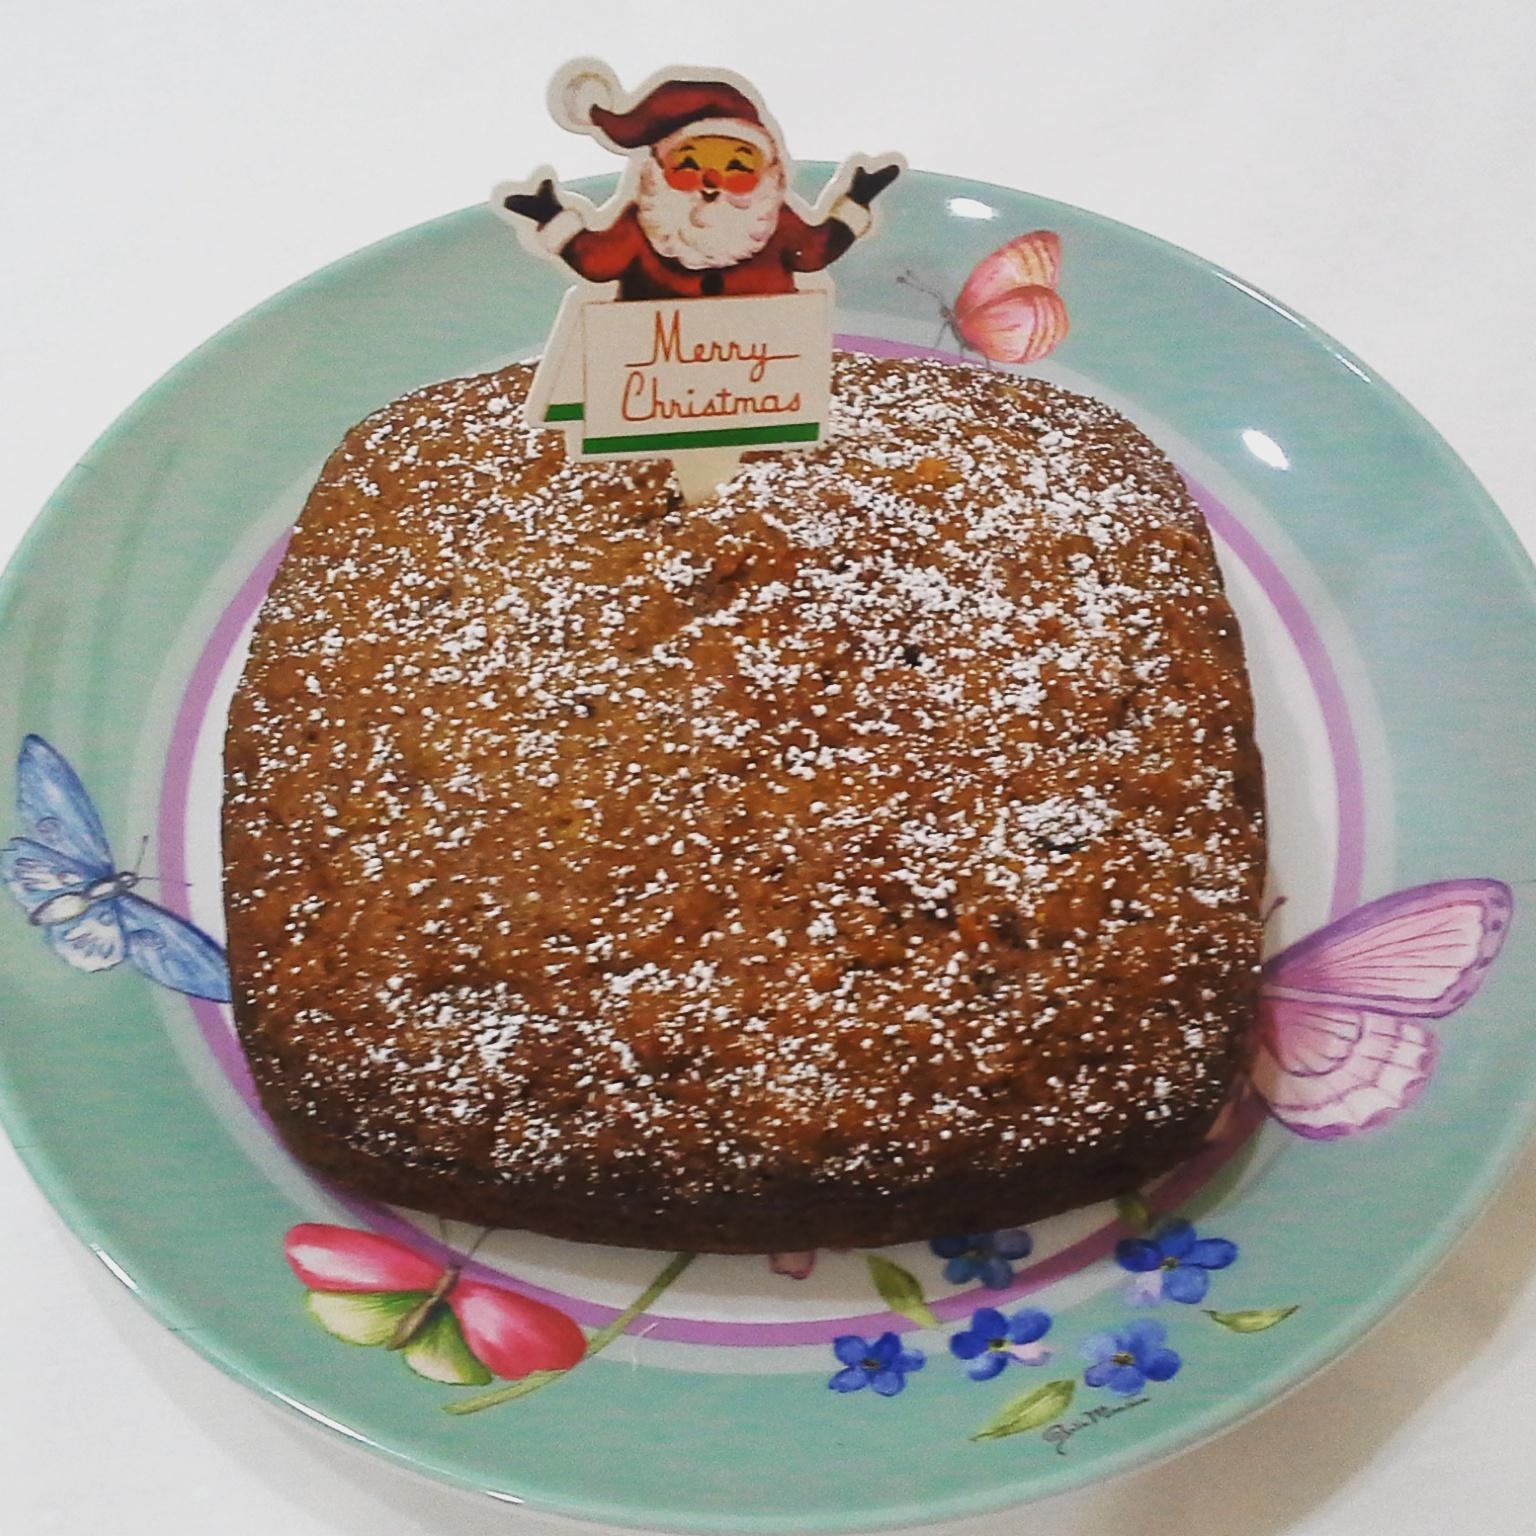 Cake Recipe Using Airfryer